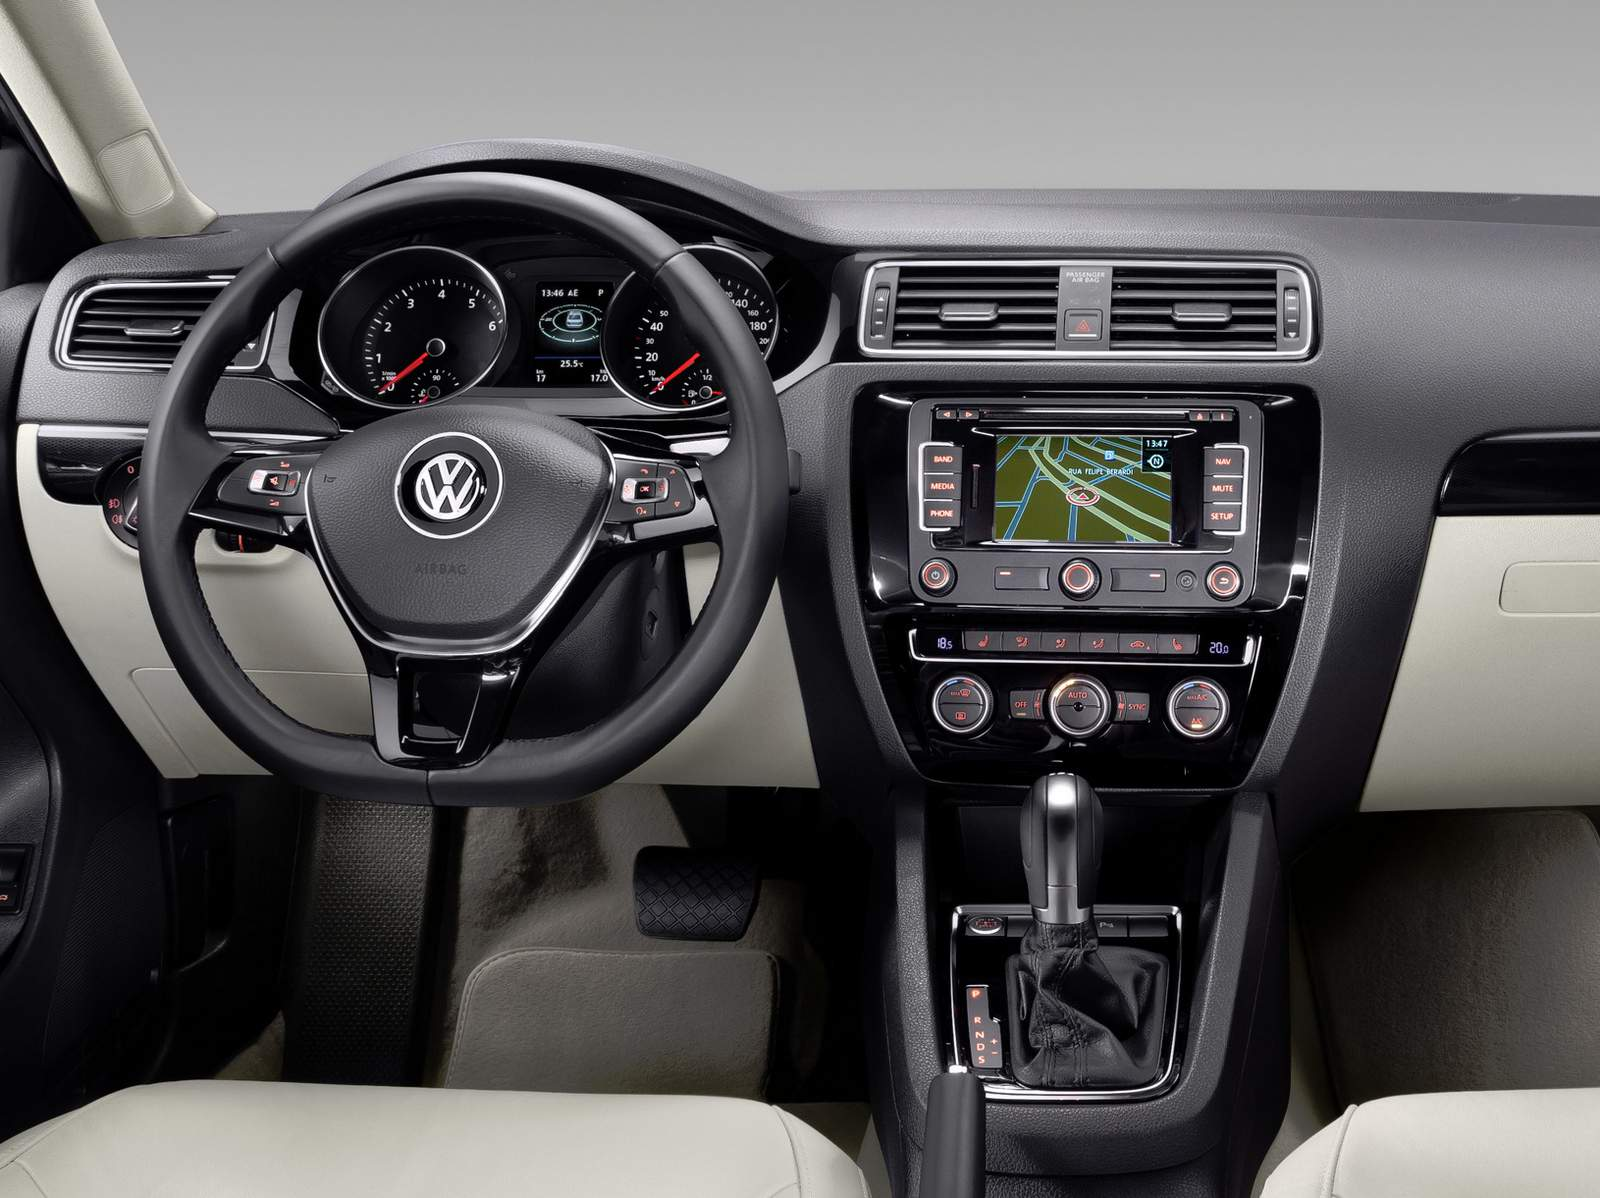 VW Jetta 2015 Highline - interior